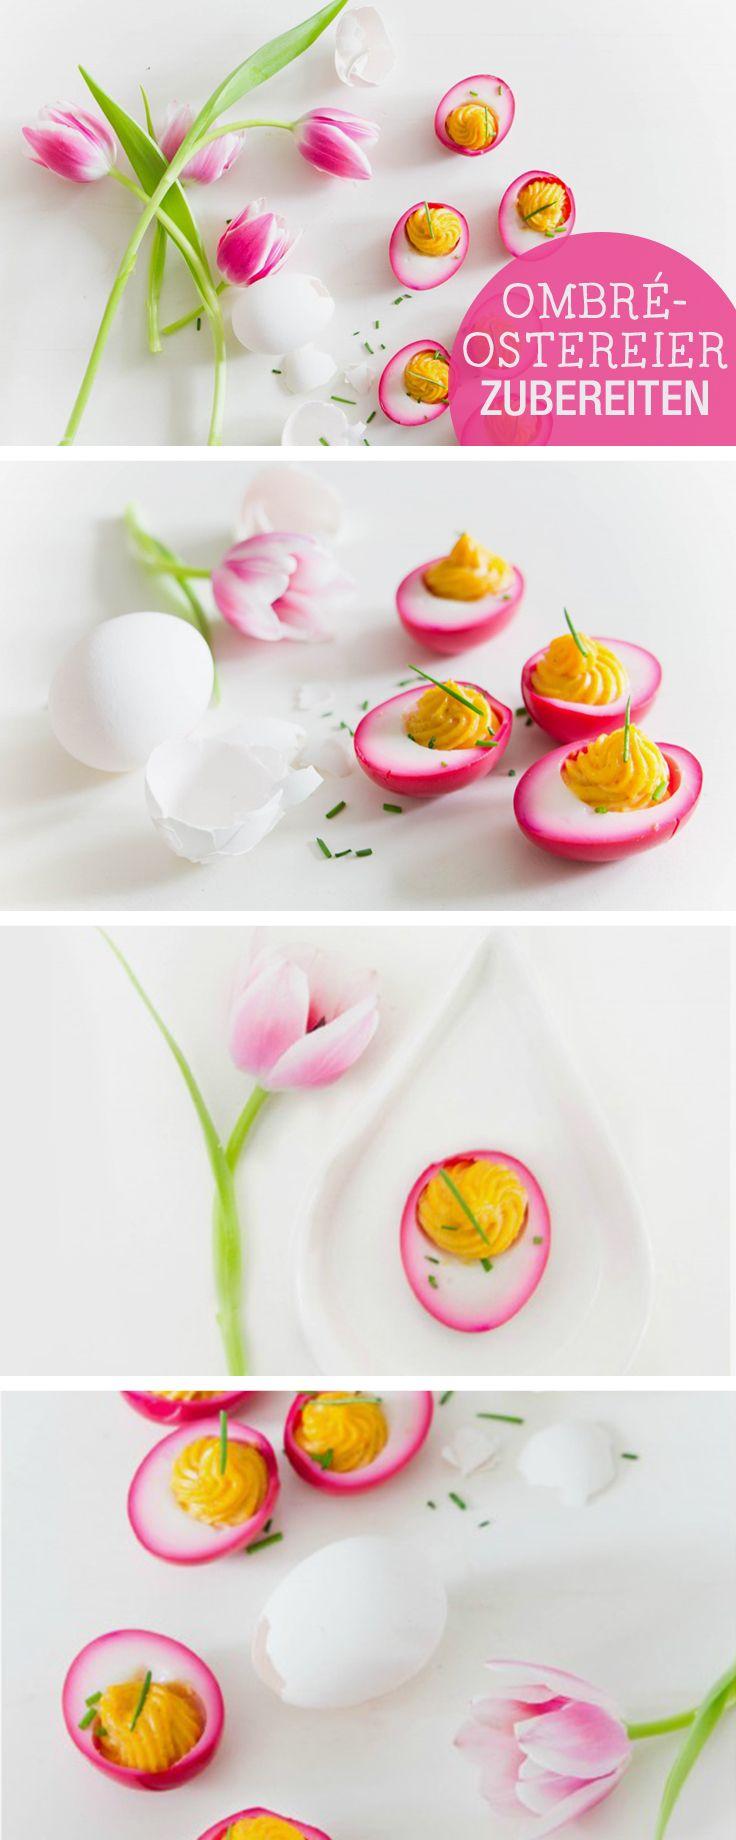 Besondere Rezepte für Ostern: Ostereier mit pinken Ombre-Effekt / easter recipe ideas: colour your easter eggs pink via DaWanda.com